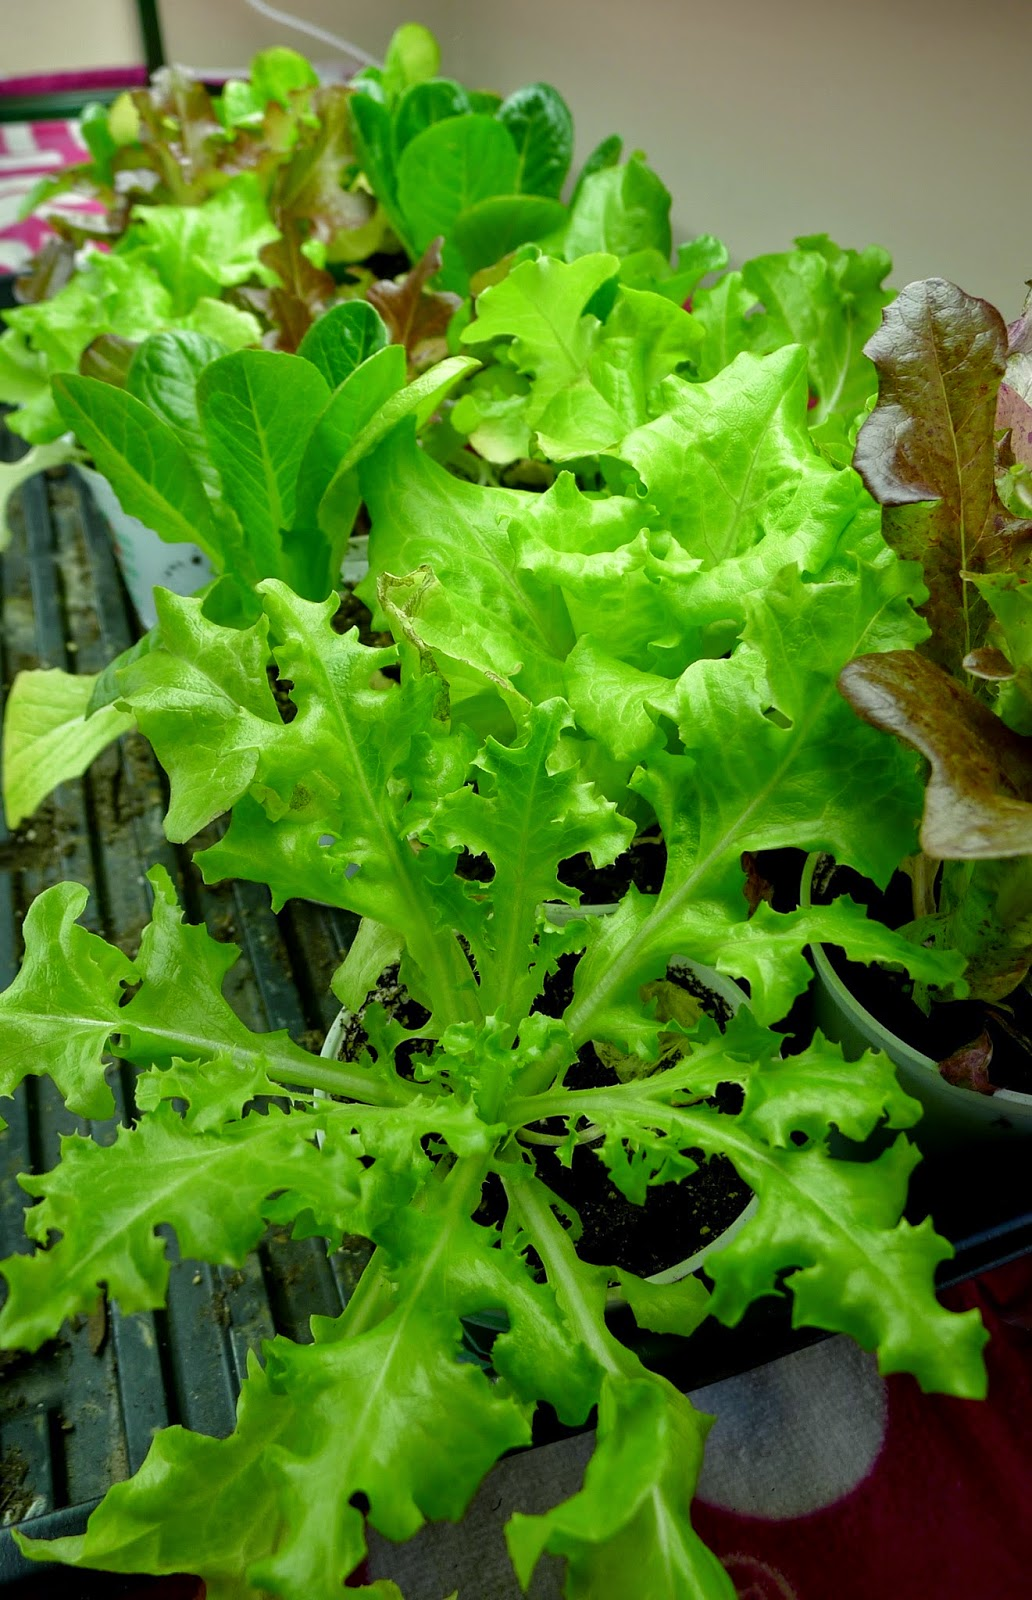 Lettuce grown under grow lights